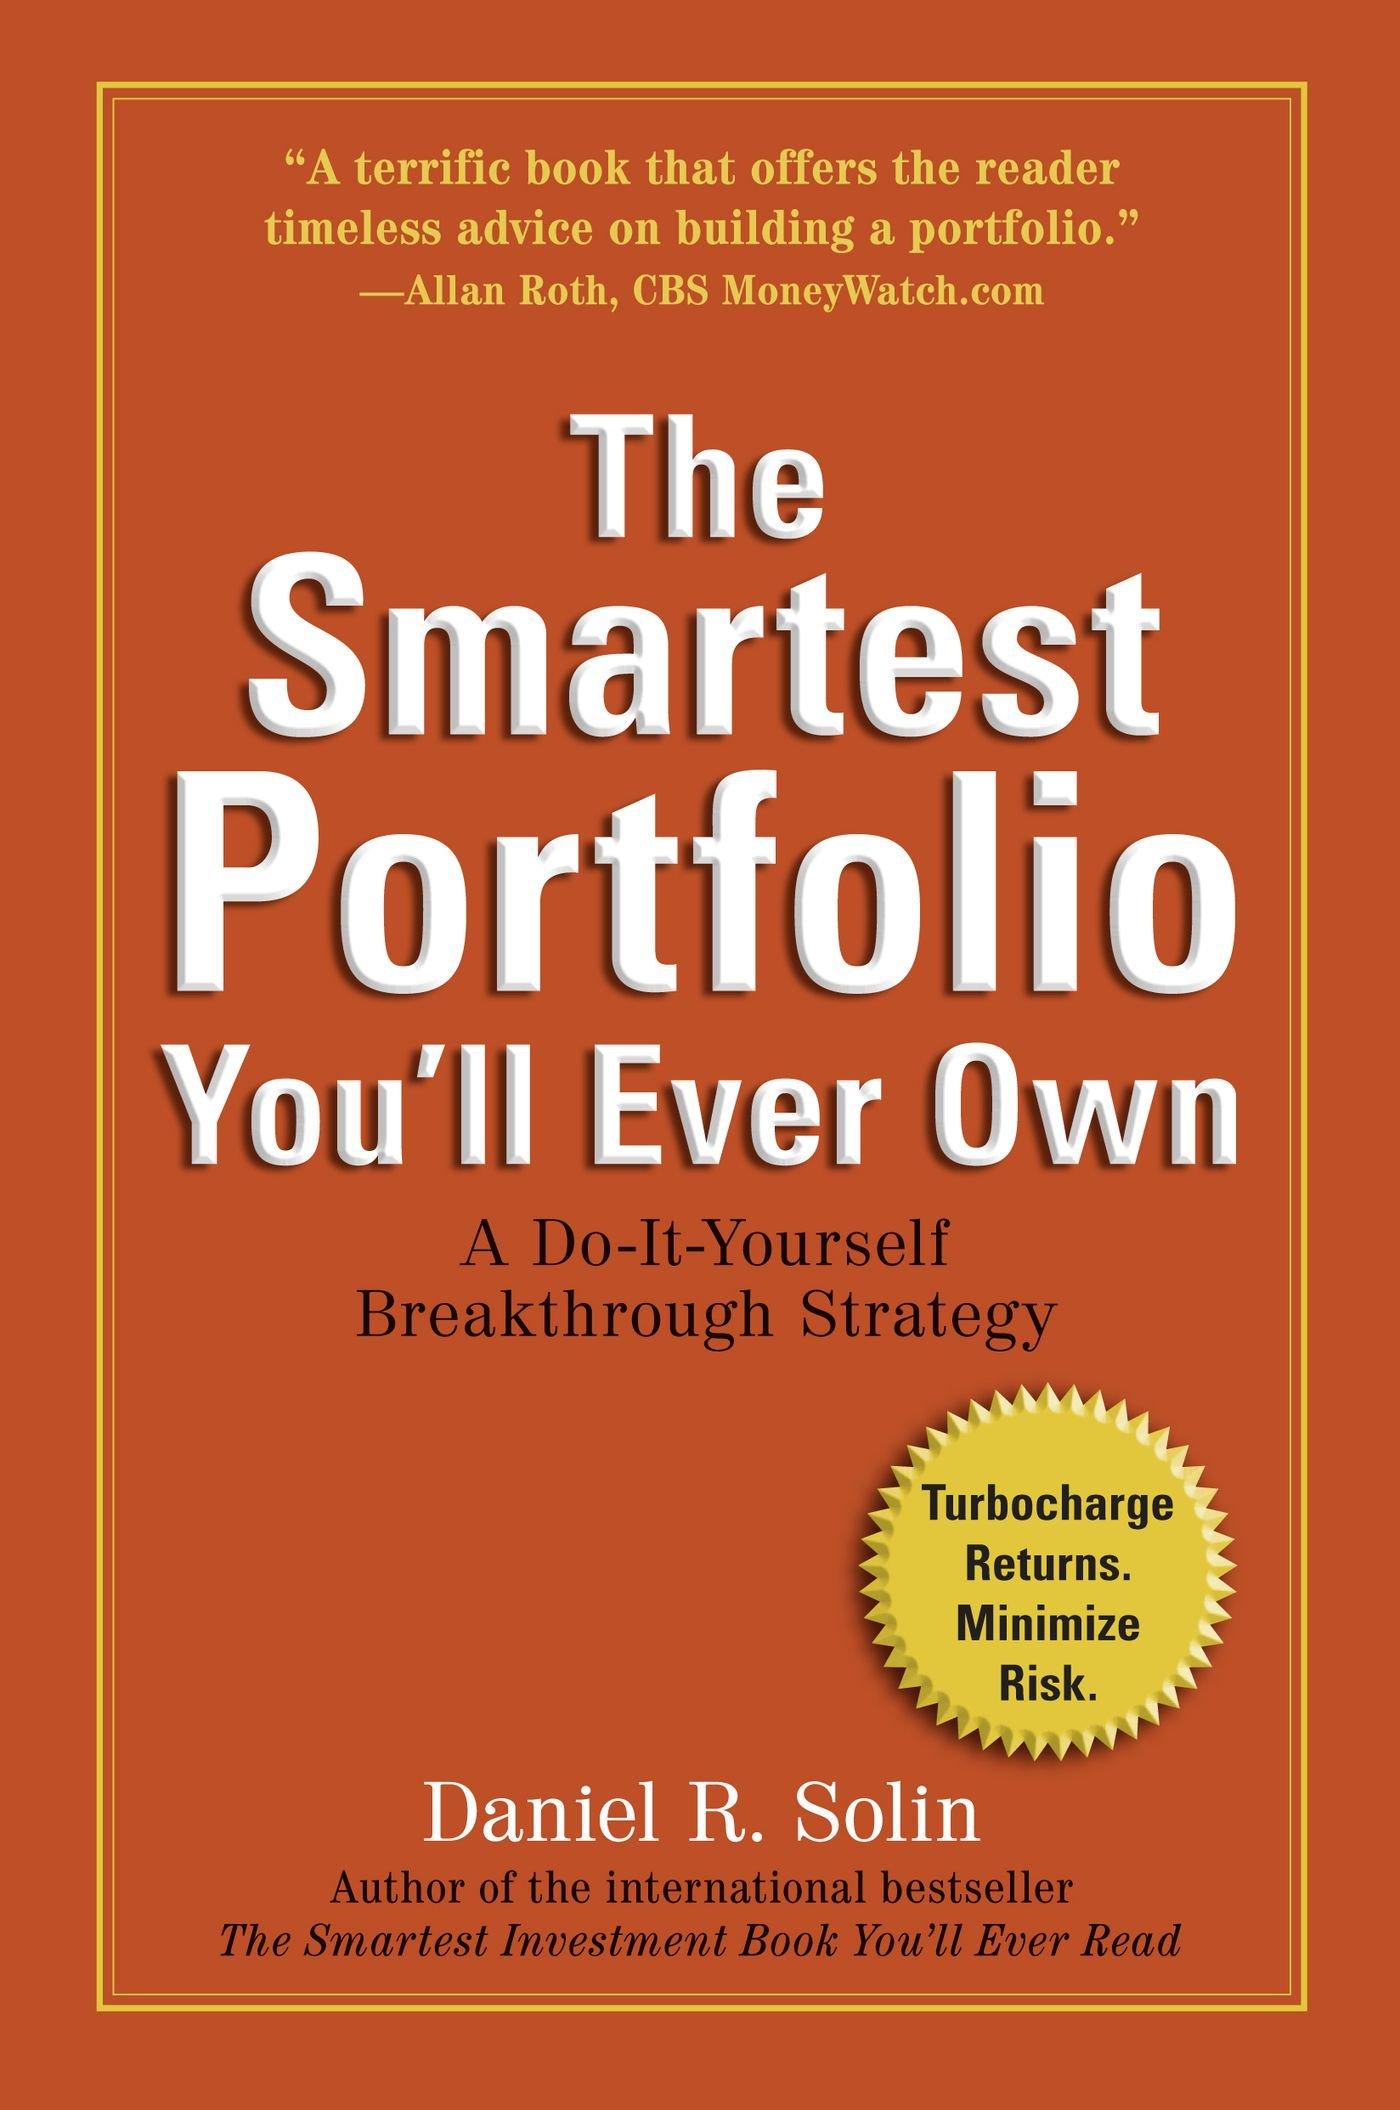 Amazon the smartest portfolio youll ever own a do it amazon the smartest portfolio youll ever own a do it yourself breakthrough strategy 9780399537790 daniel r solin books solutioingenieria Choice Image